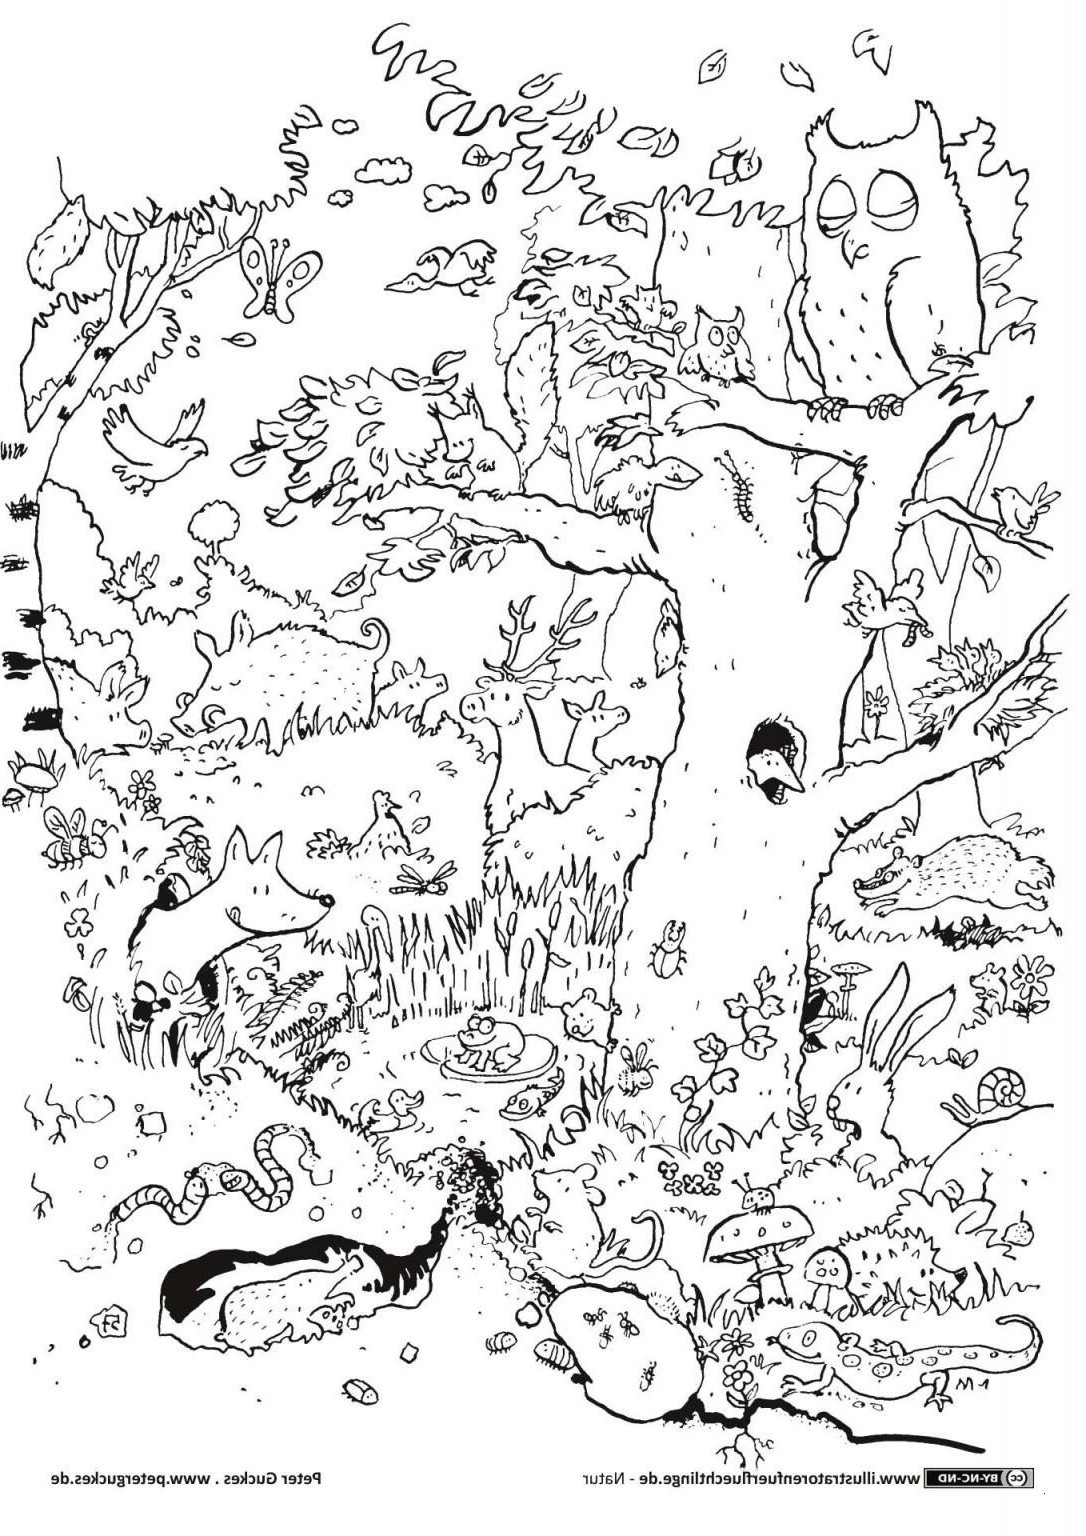 Ninjago Kai Ausmalbilder Neu 36 Luxus Ausmalbilder Ninjago Kostenlos – Große Coloring Page Sammlung Fotografieren